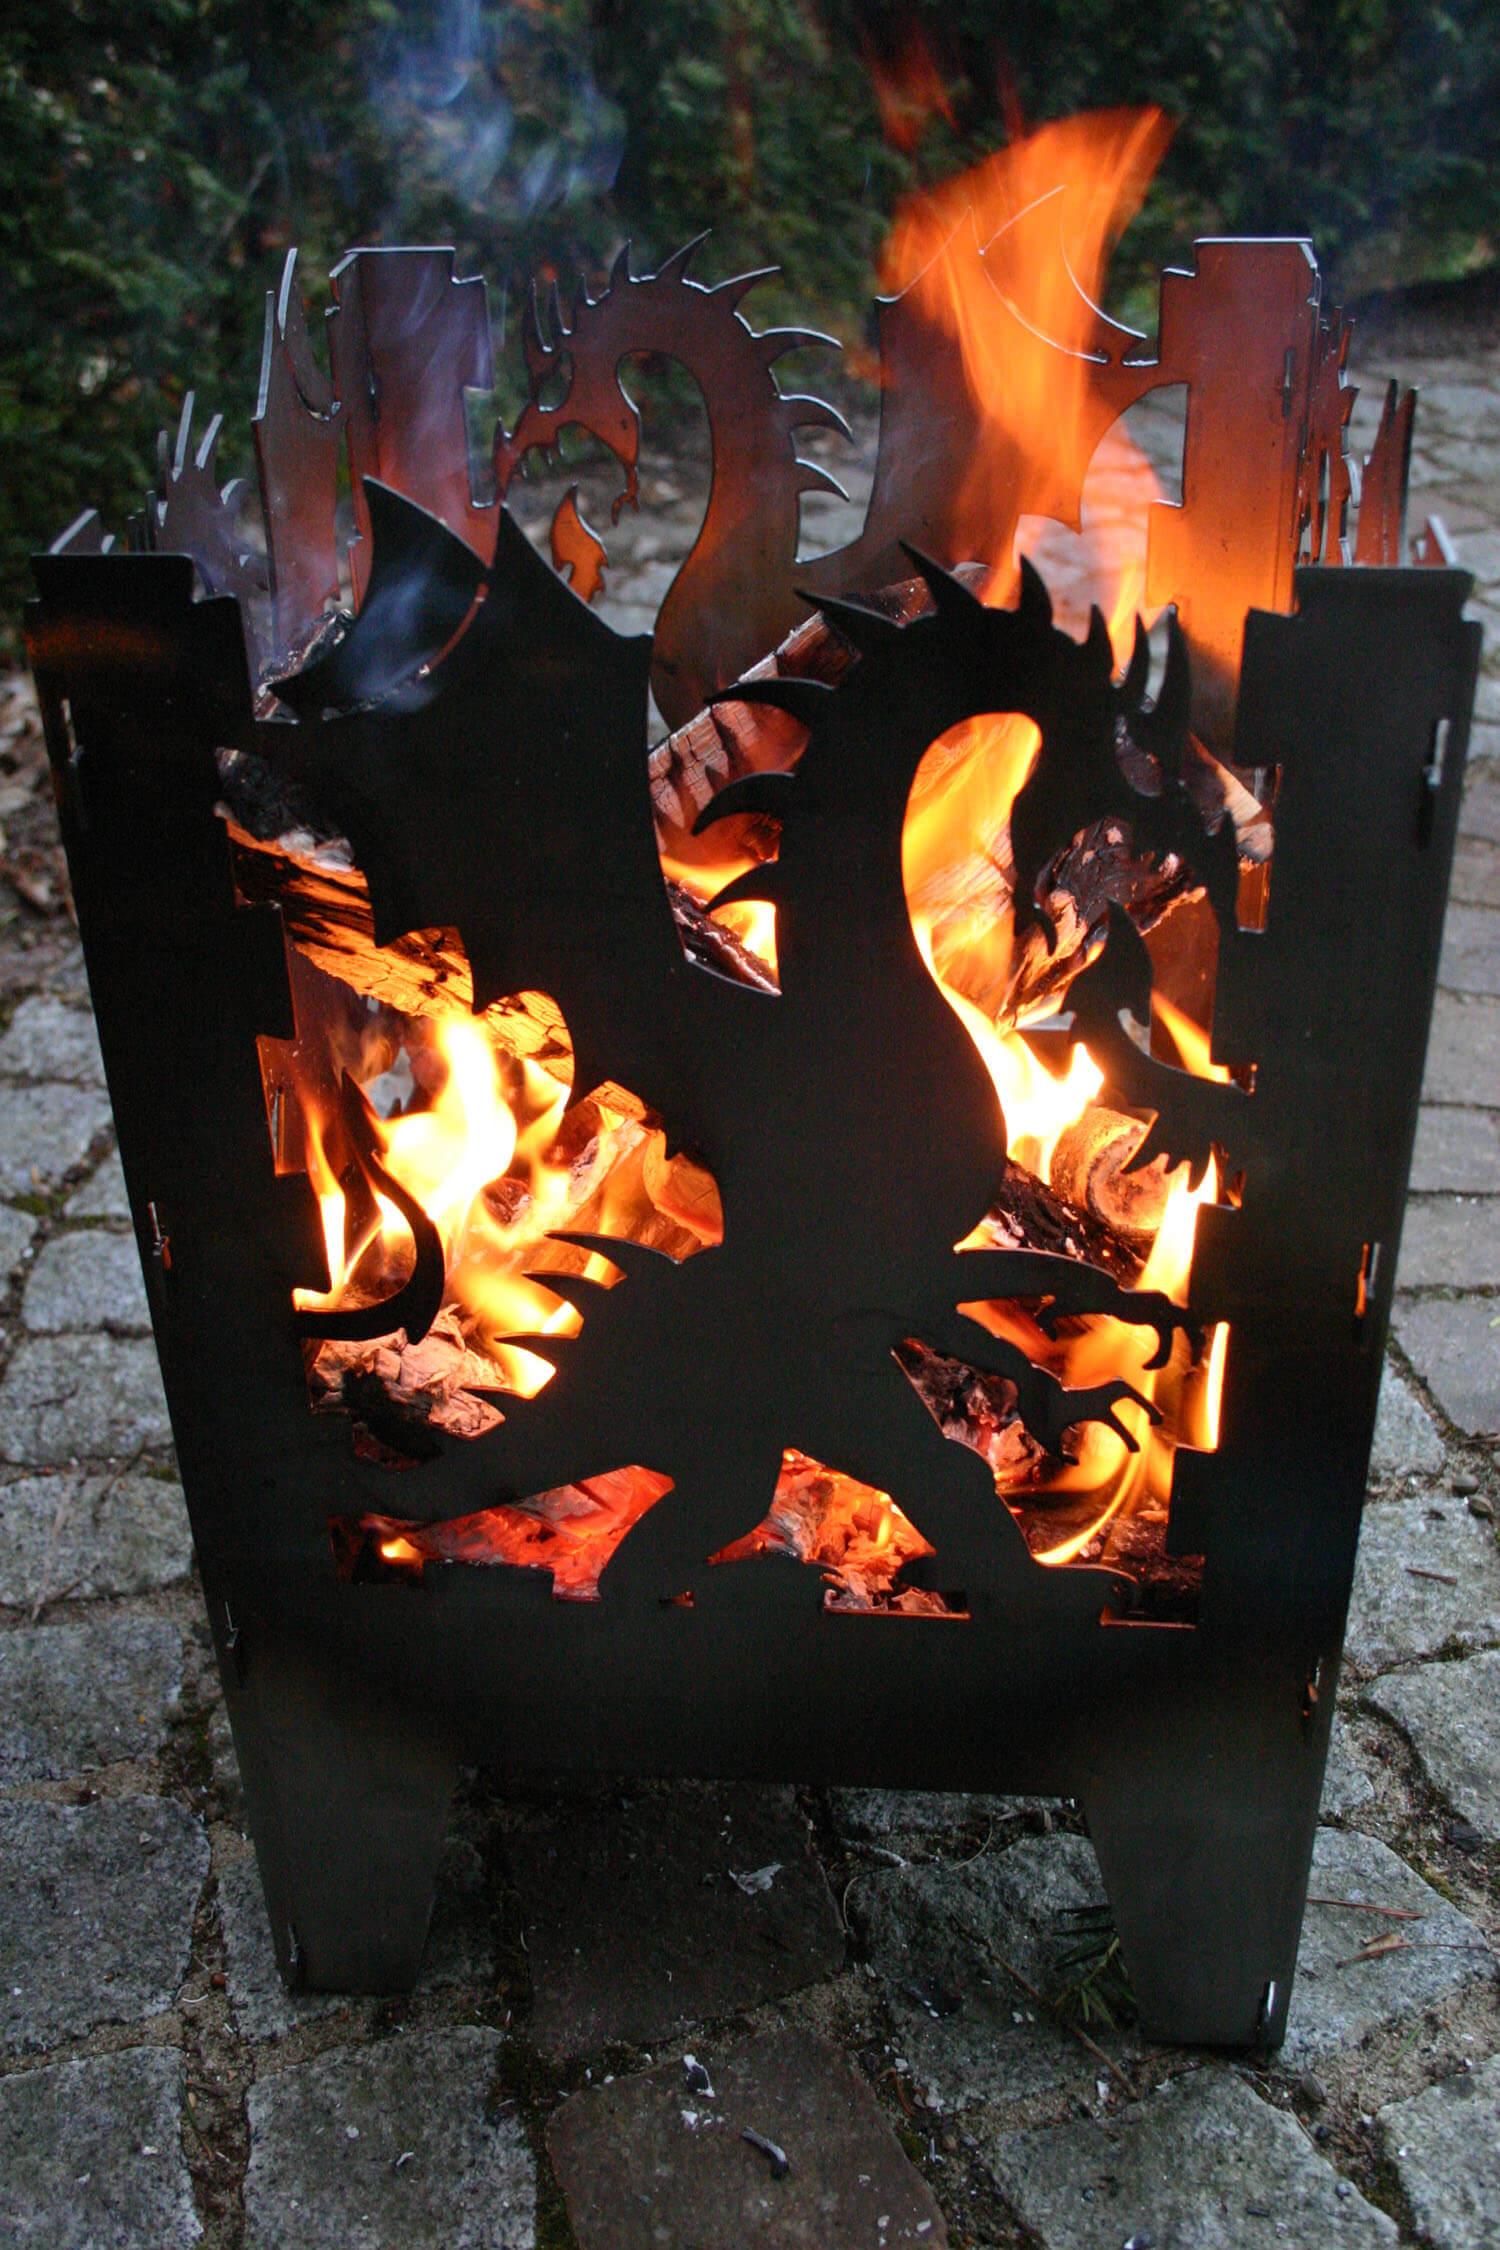 design feuerkorb drache 2 gr en metall feuerstelle brenntopf feuerschale ebay. Black Bedroom Furniture Sets. Home Design Ideas